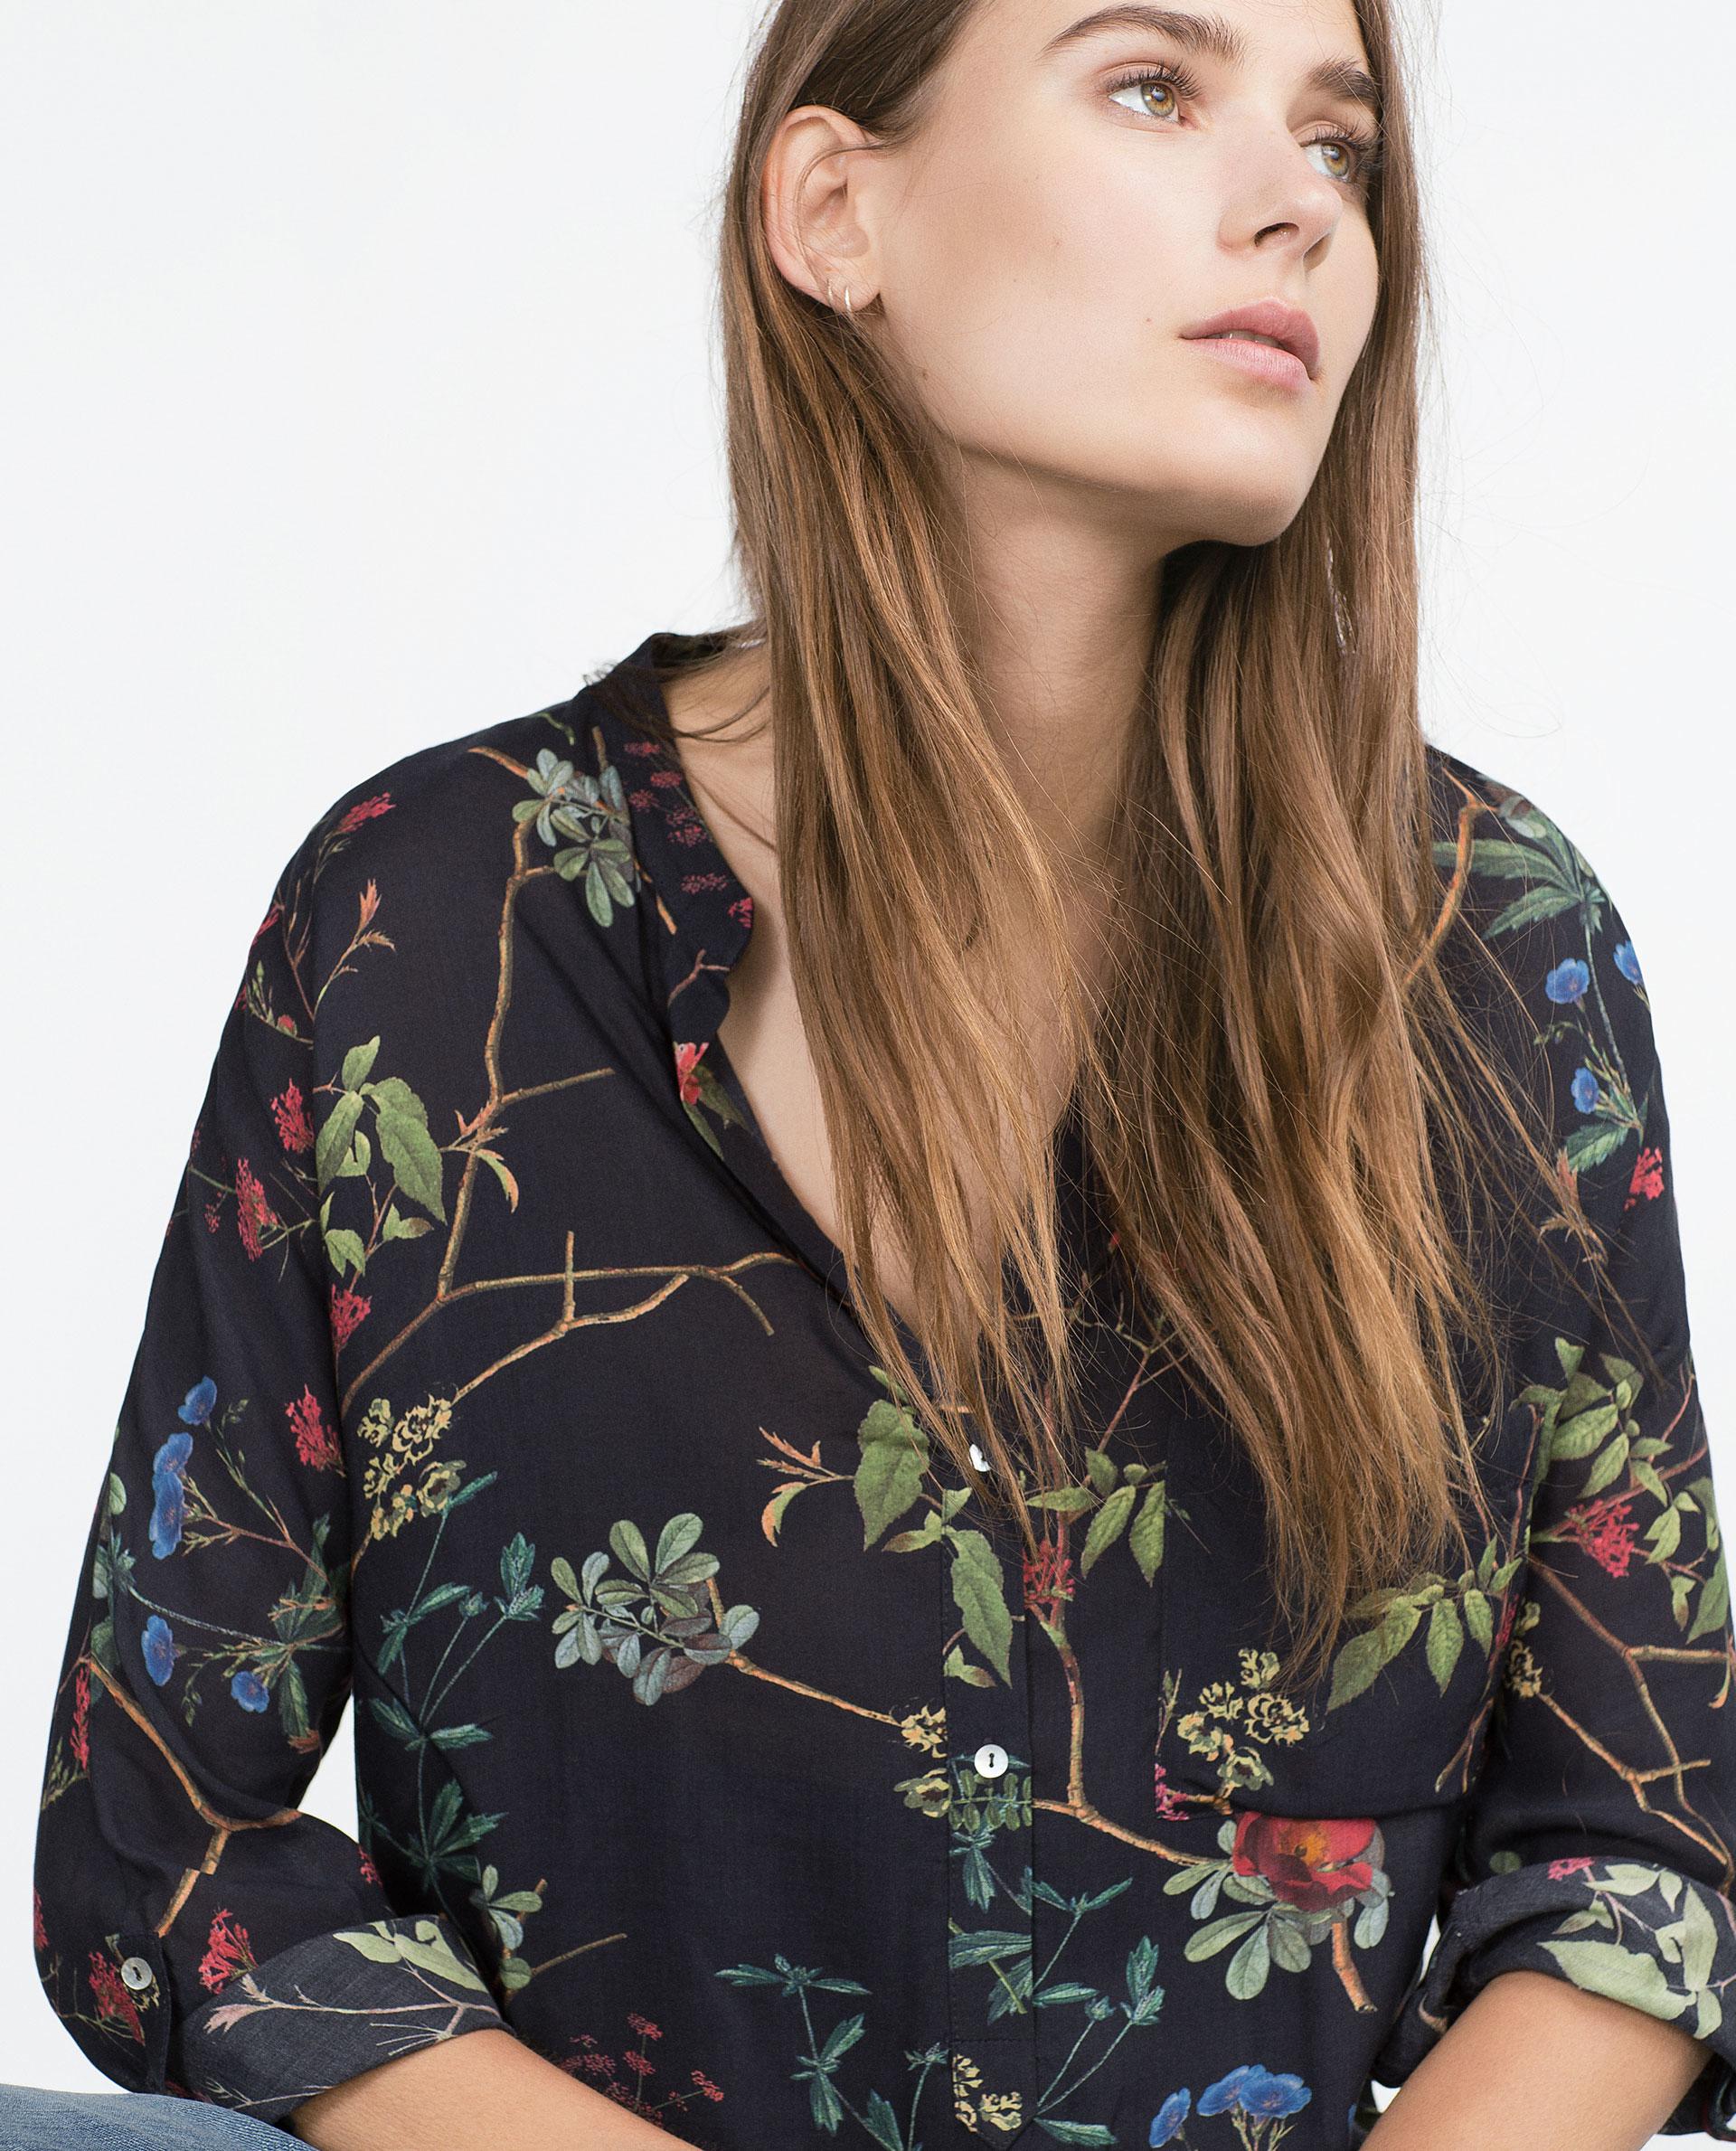 Zara Printed Blouse Ebay 5